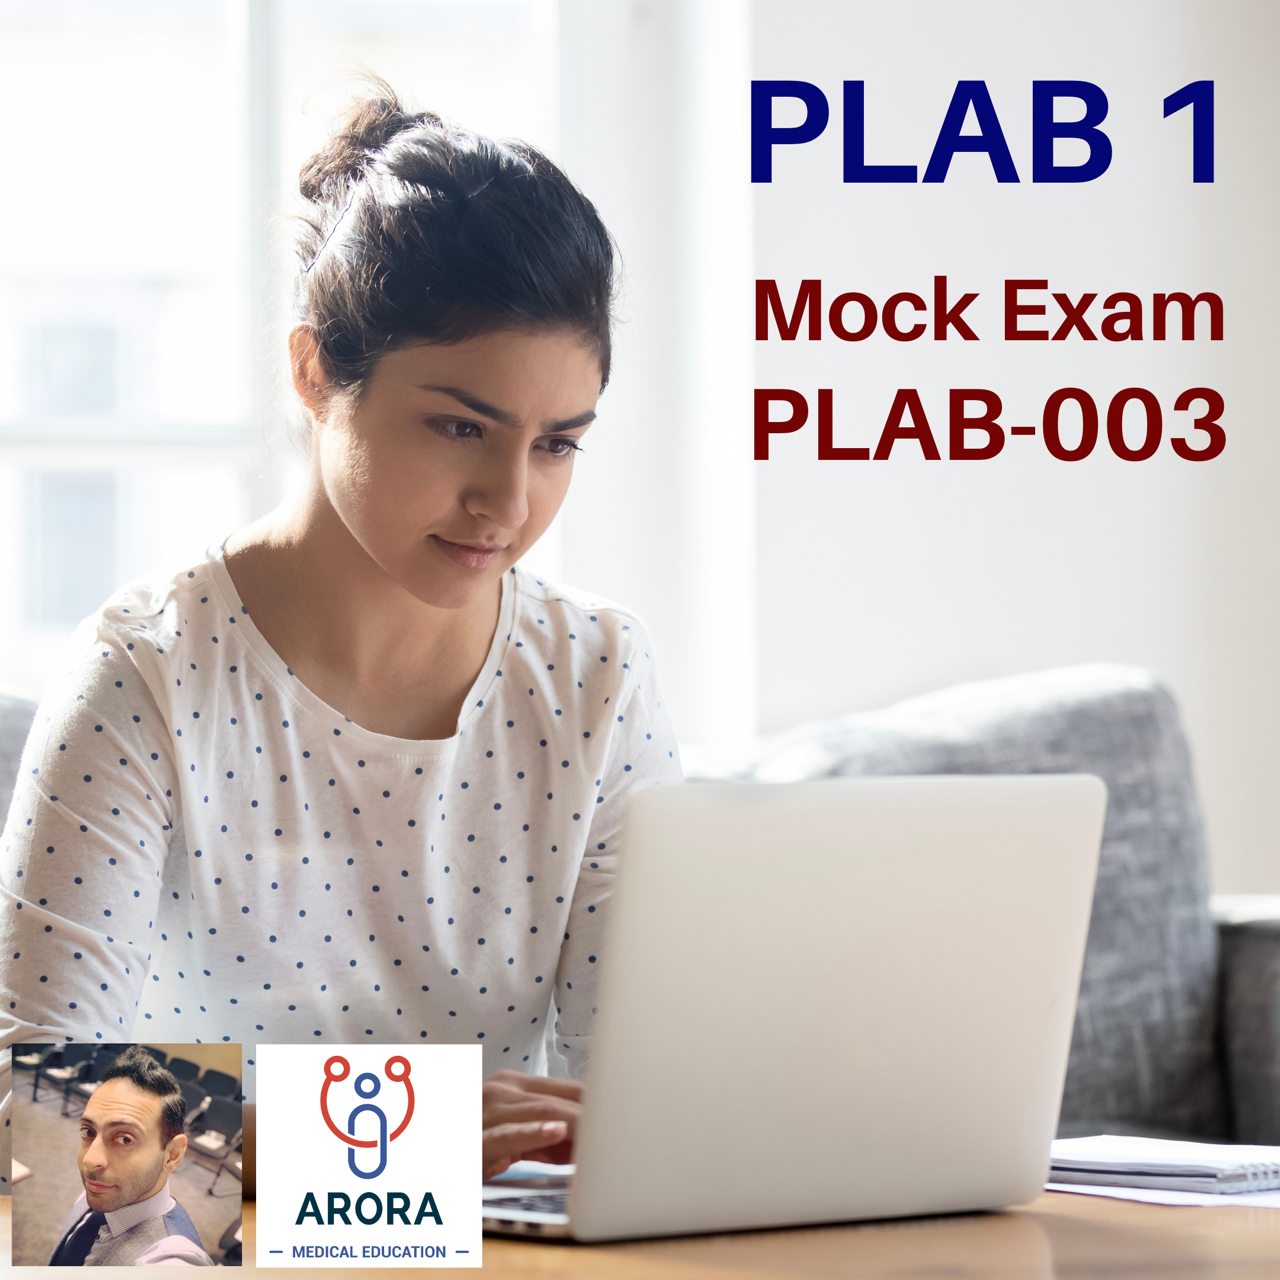 PLAB 003 - MRCGP CSA, AKT and PLAB Exam Courses and Online Webinars - Arora Medical Education